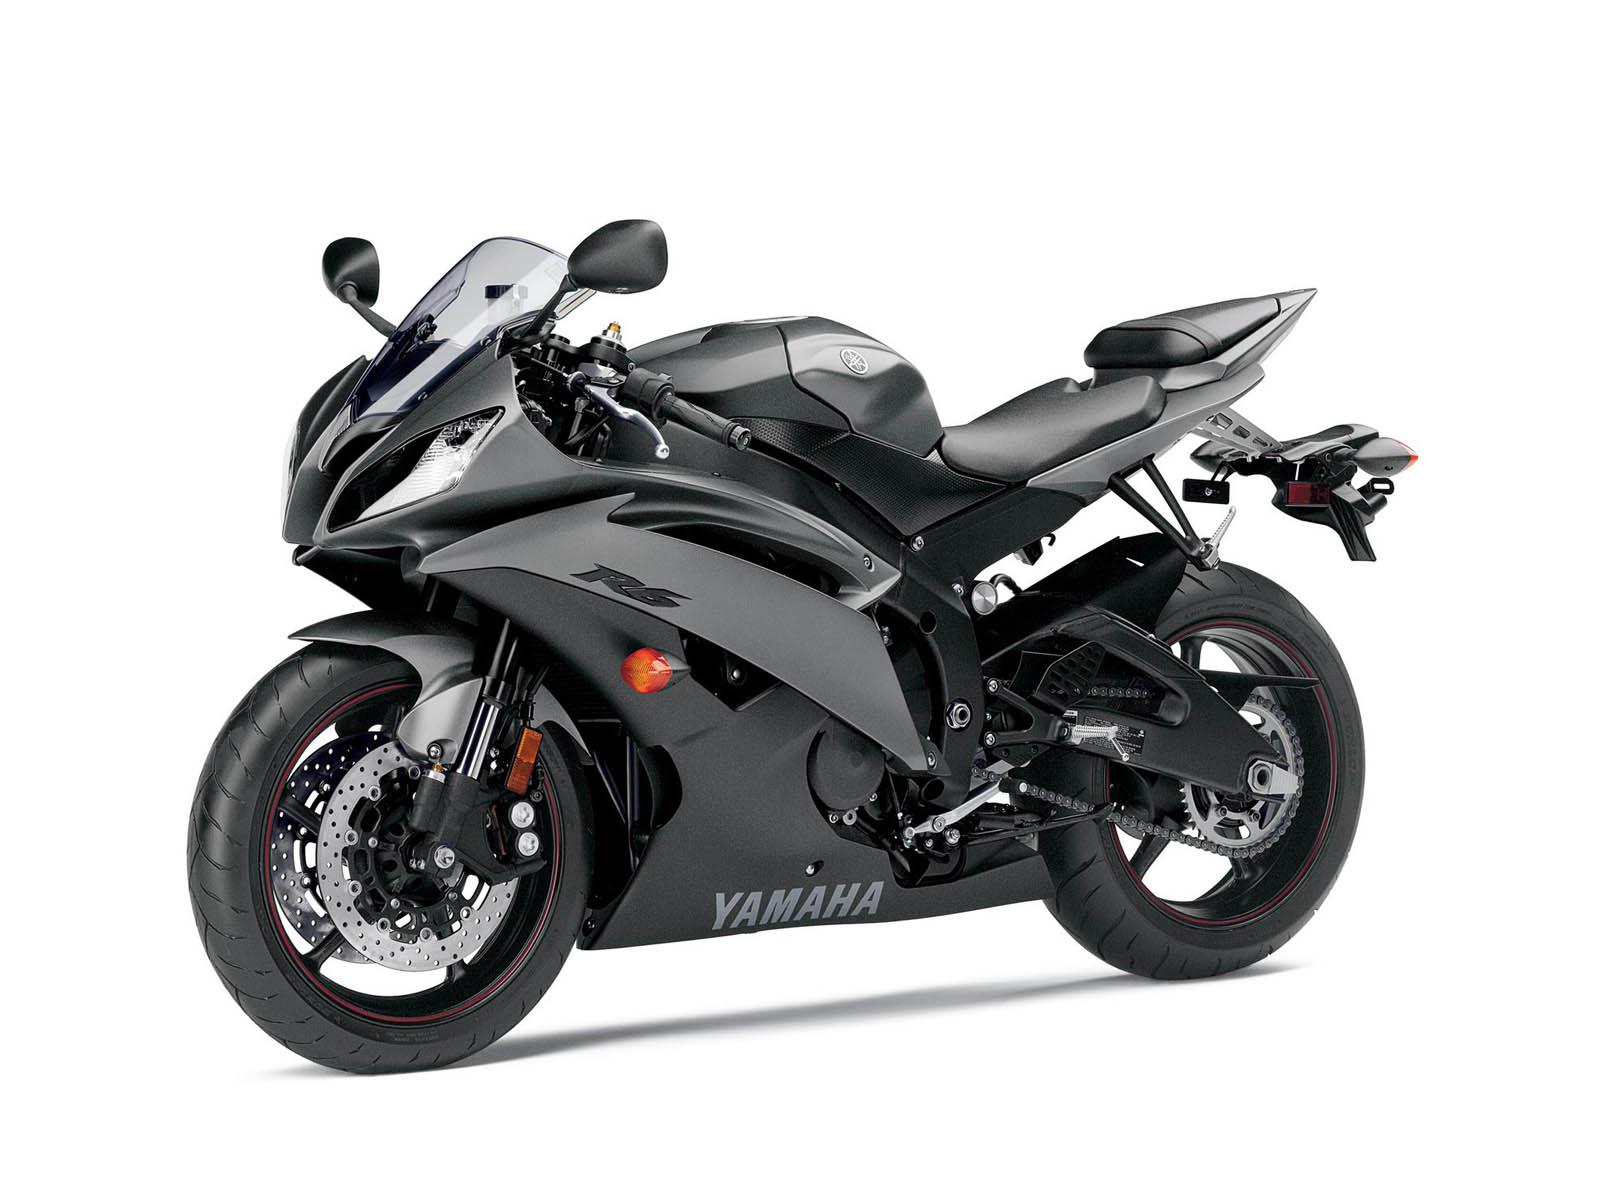 Yamaha R Bike Images Free Download